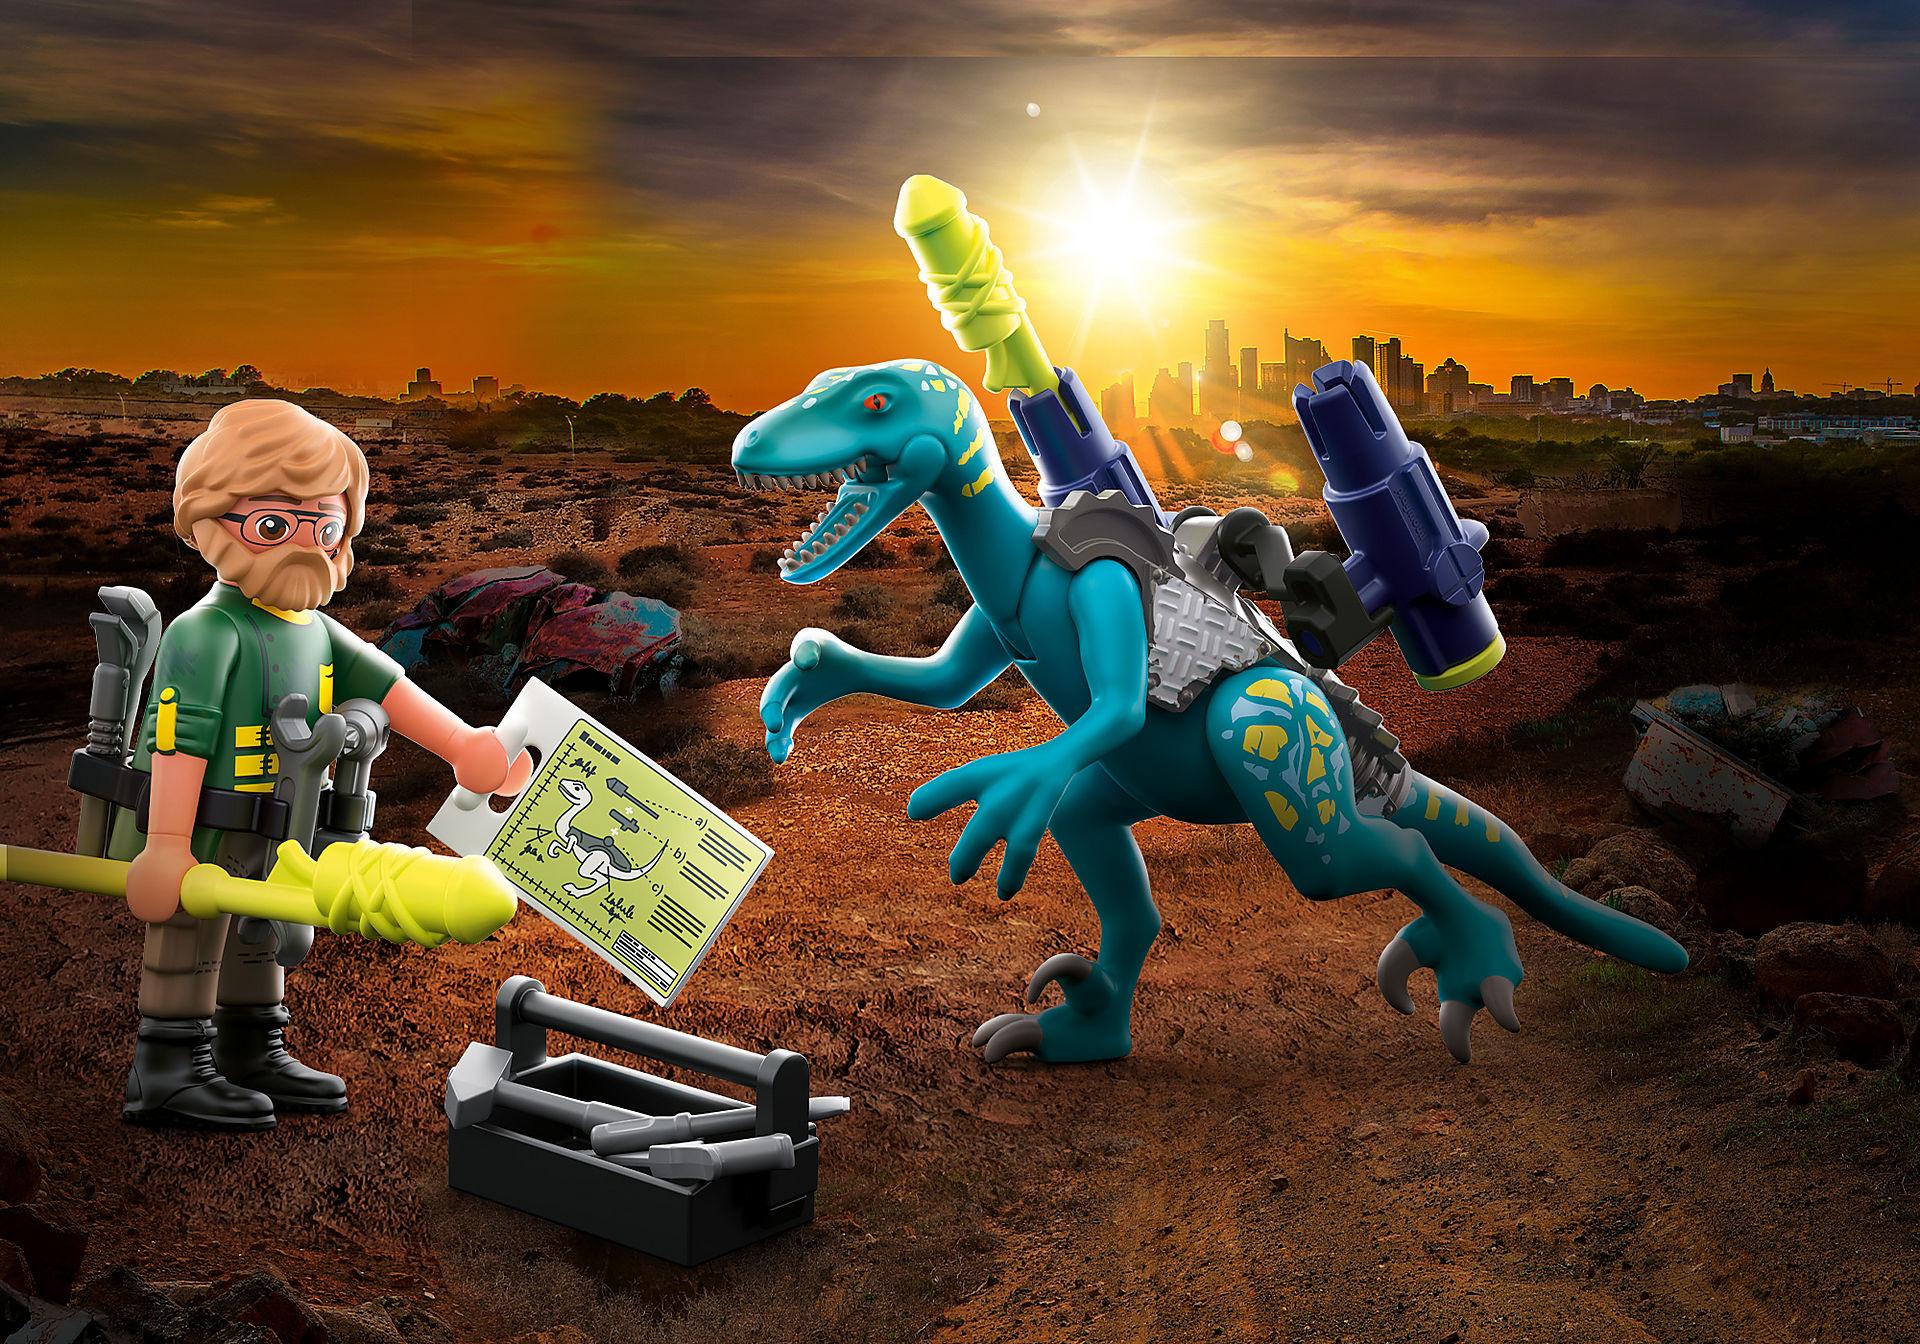 70629 Deinonychus: Ready for Battle zoom image1